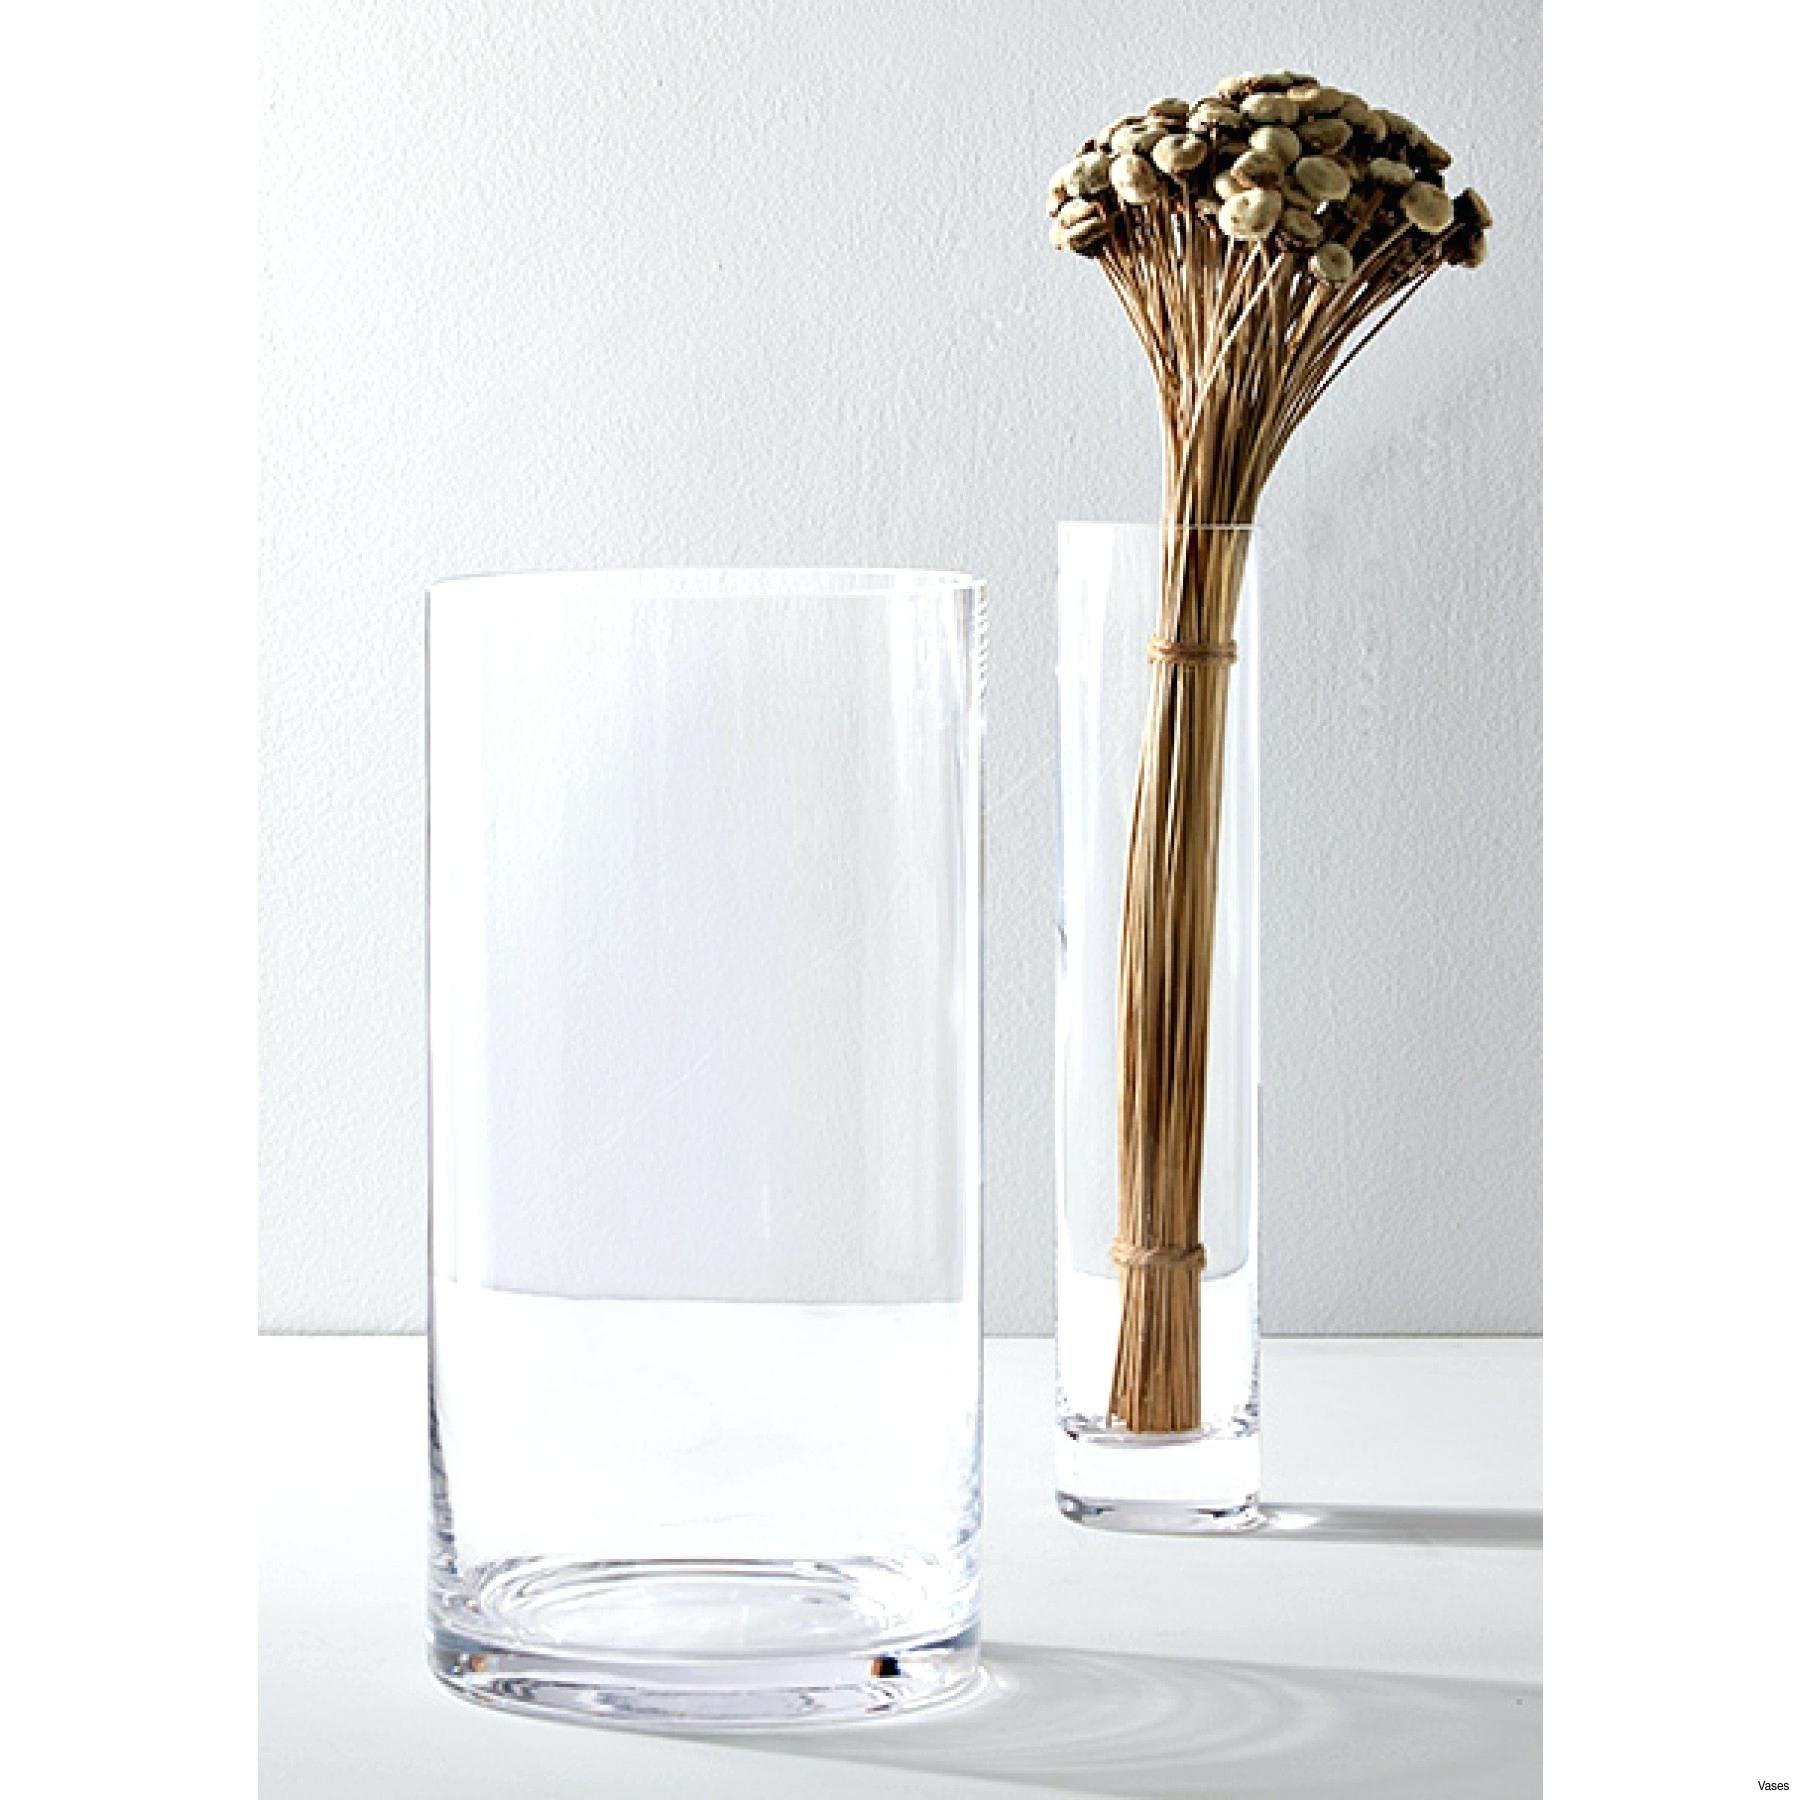 Bulk Glass Vases for Wedding Of Beautiful Dollar Tree Sign 2018 Ogahealth Com Pertaining to Glass Cylinder Vases Bulk Uk Dollar Tree Tall Cheap Gallery Also Bulkh Bulki 0d